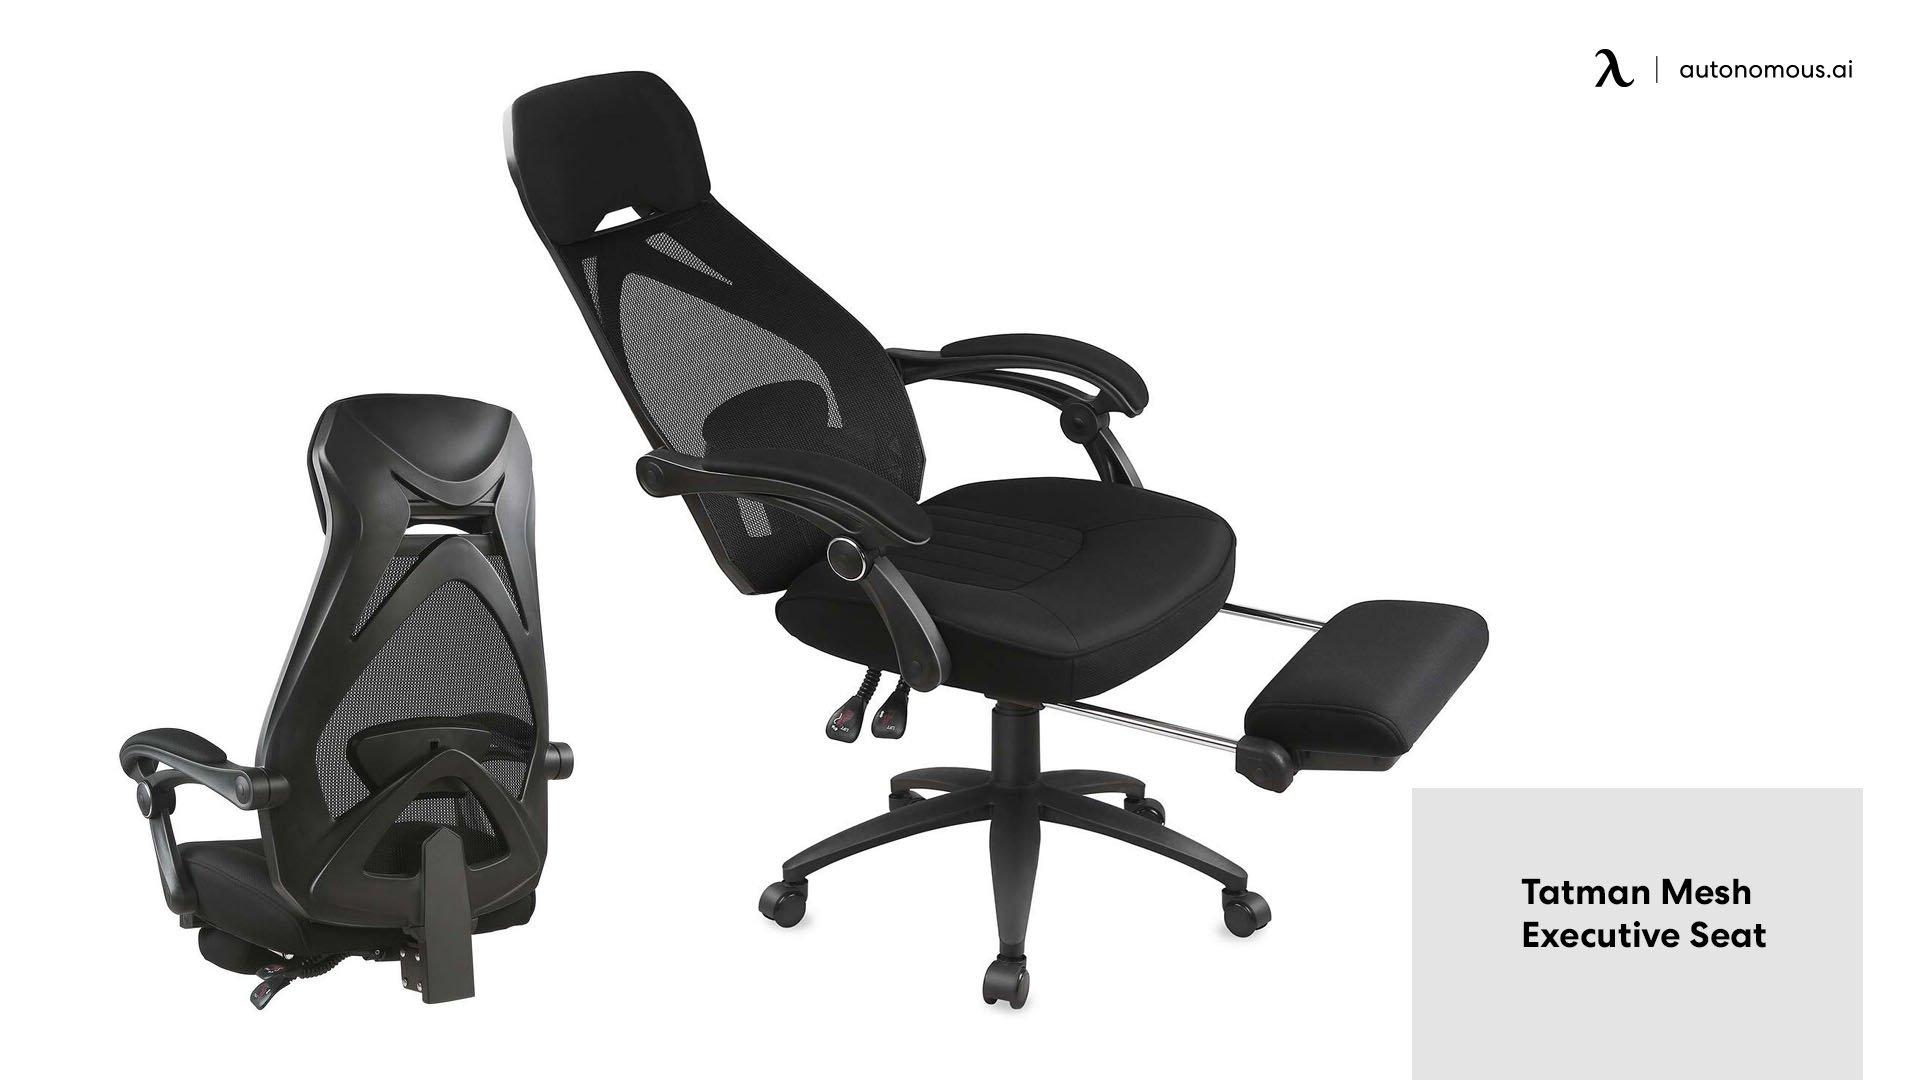 Tatman Mesh Executive Seat